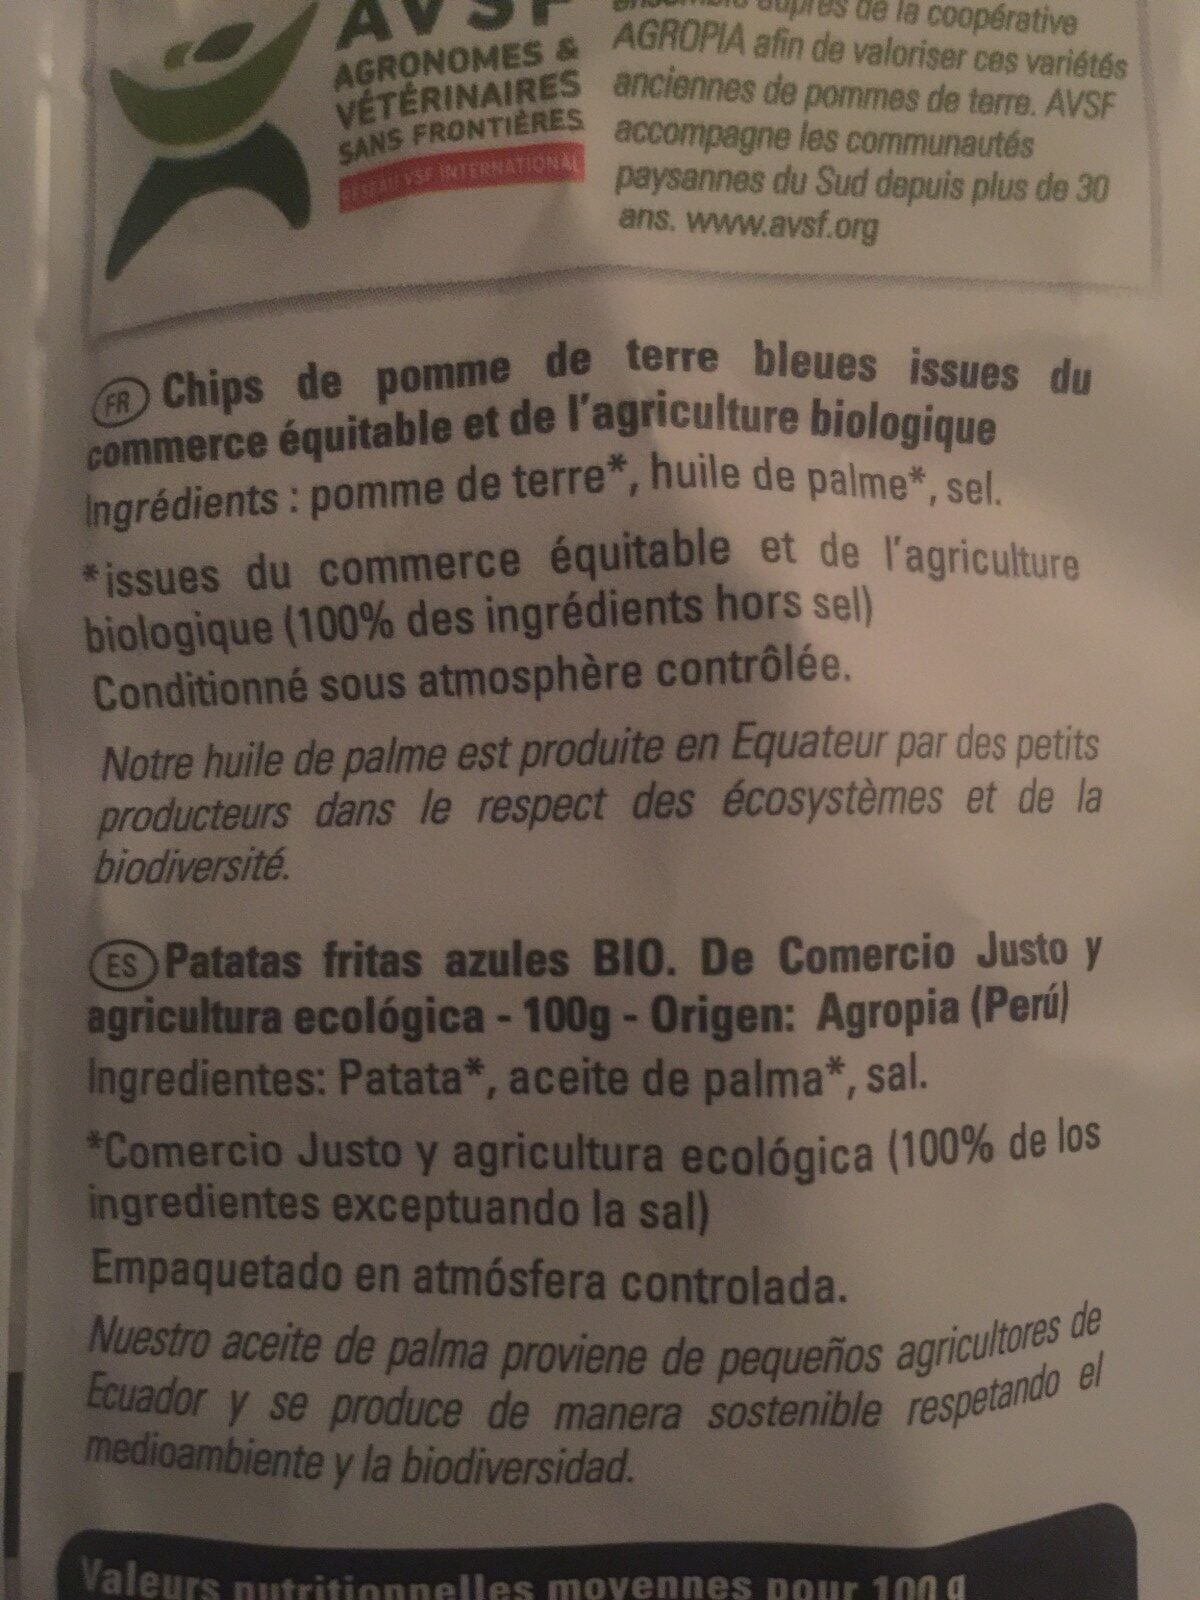 Chips pomme de terre bleue - Ingredients